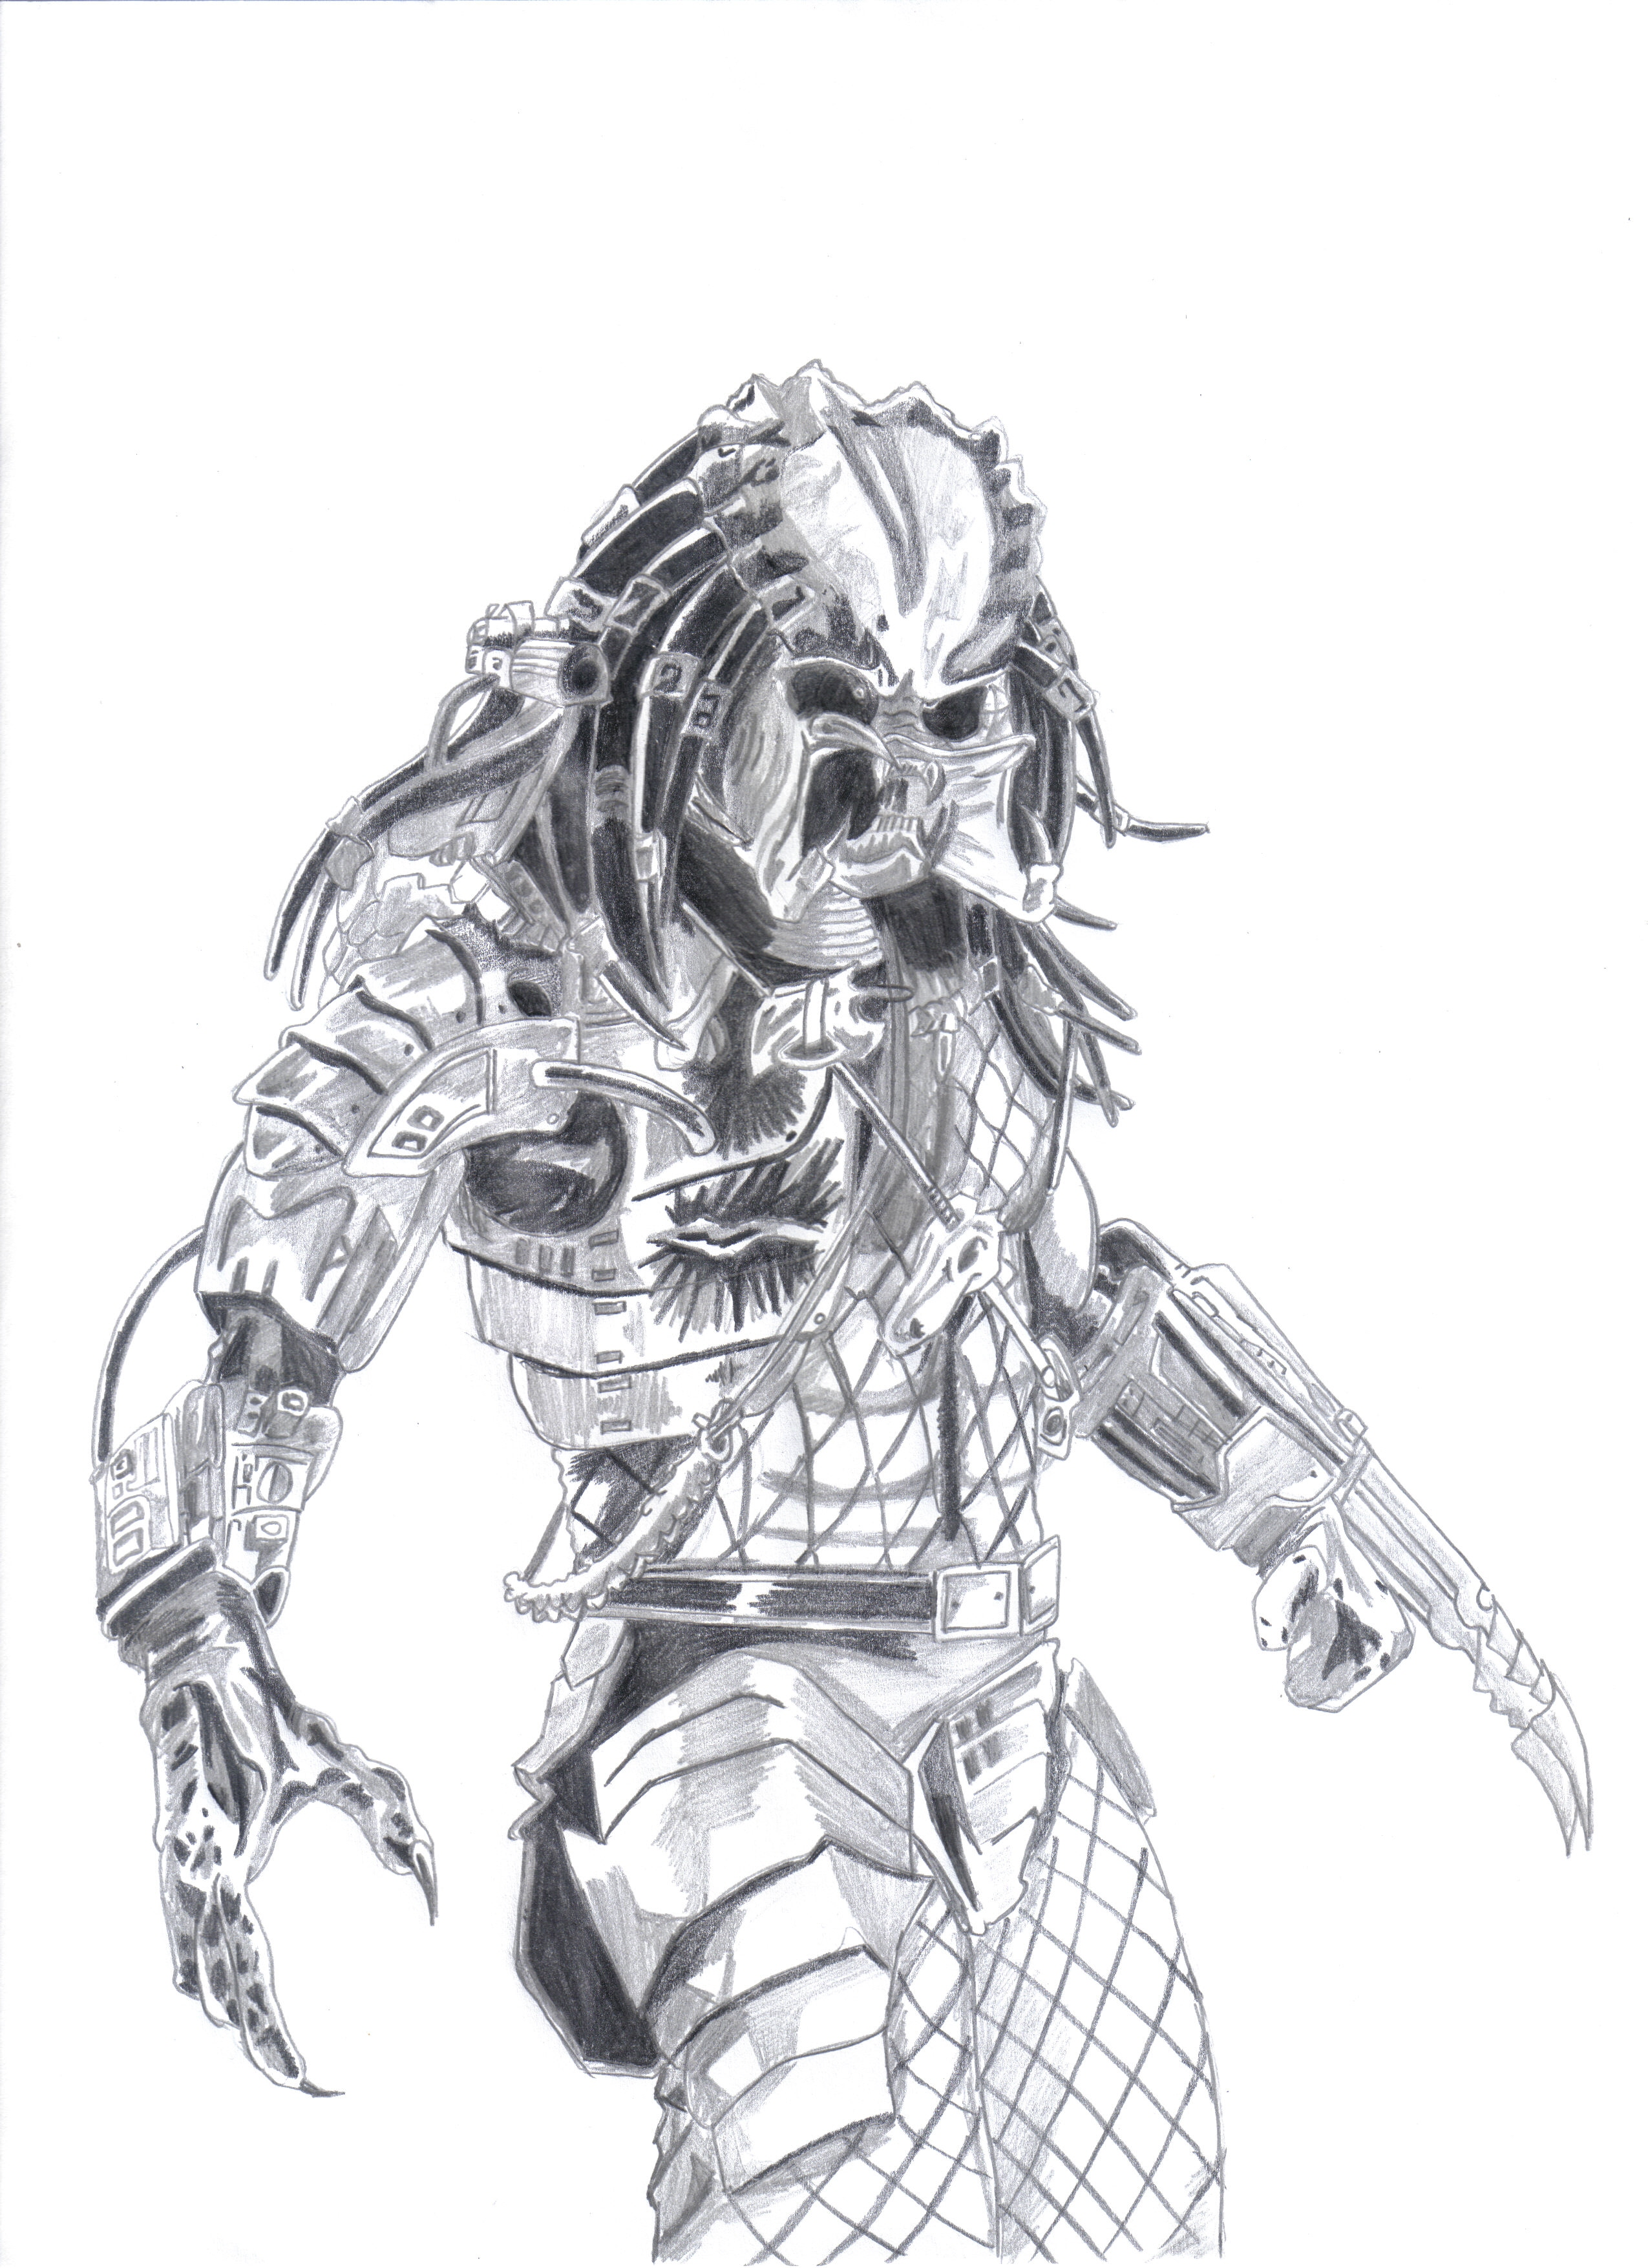 Predator by razaec on DeviantArt